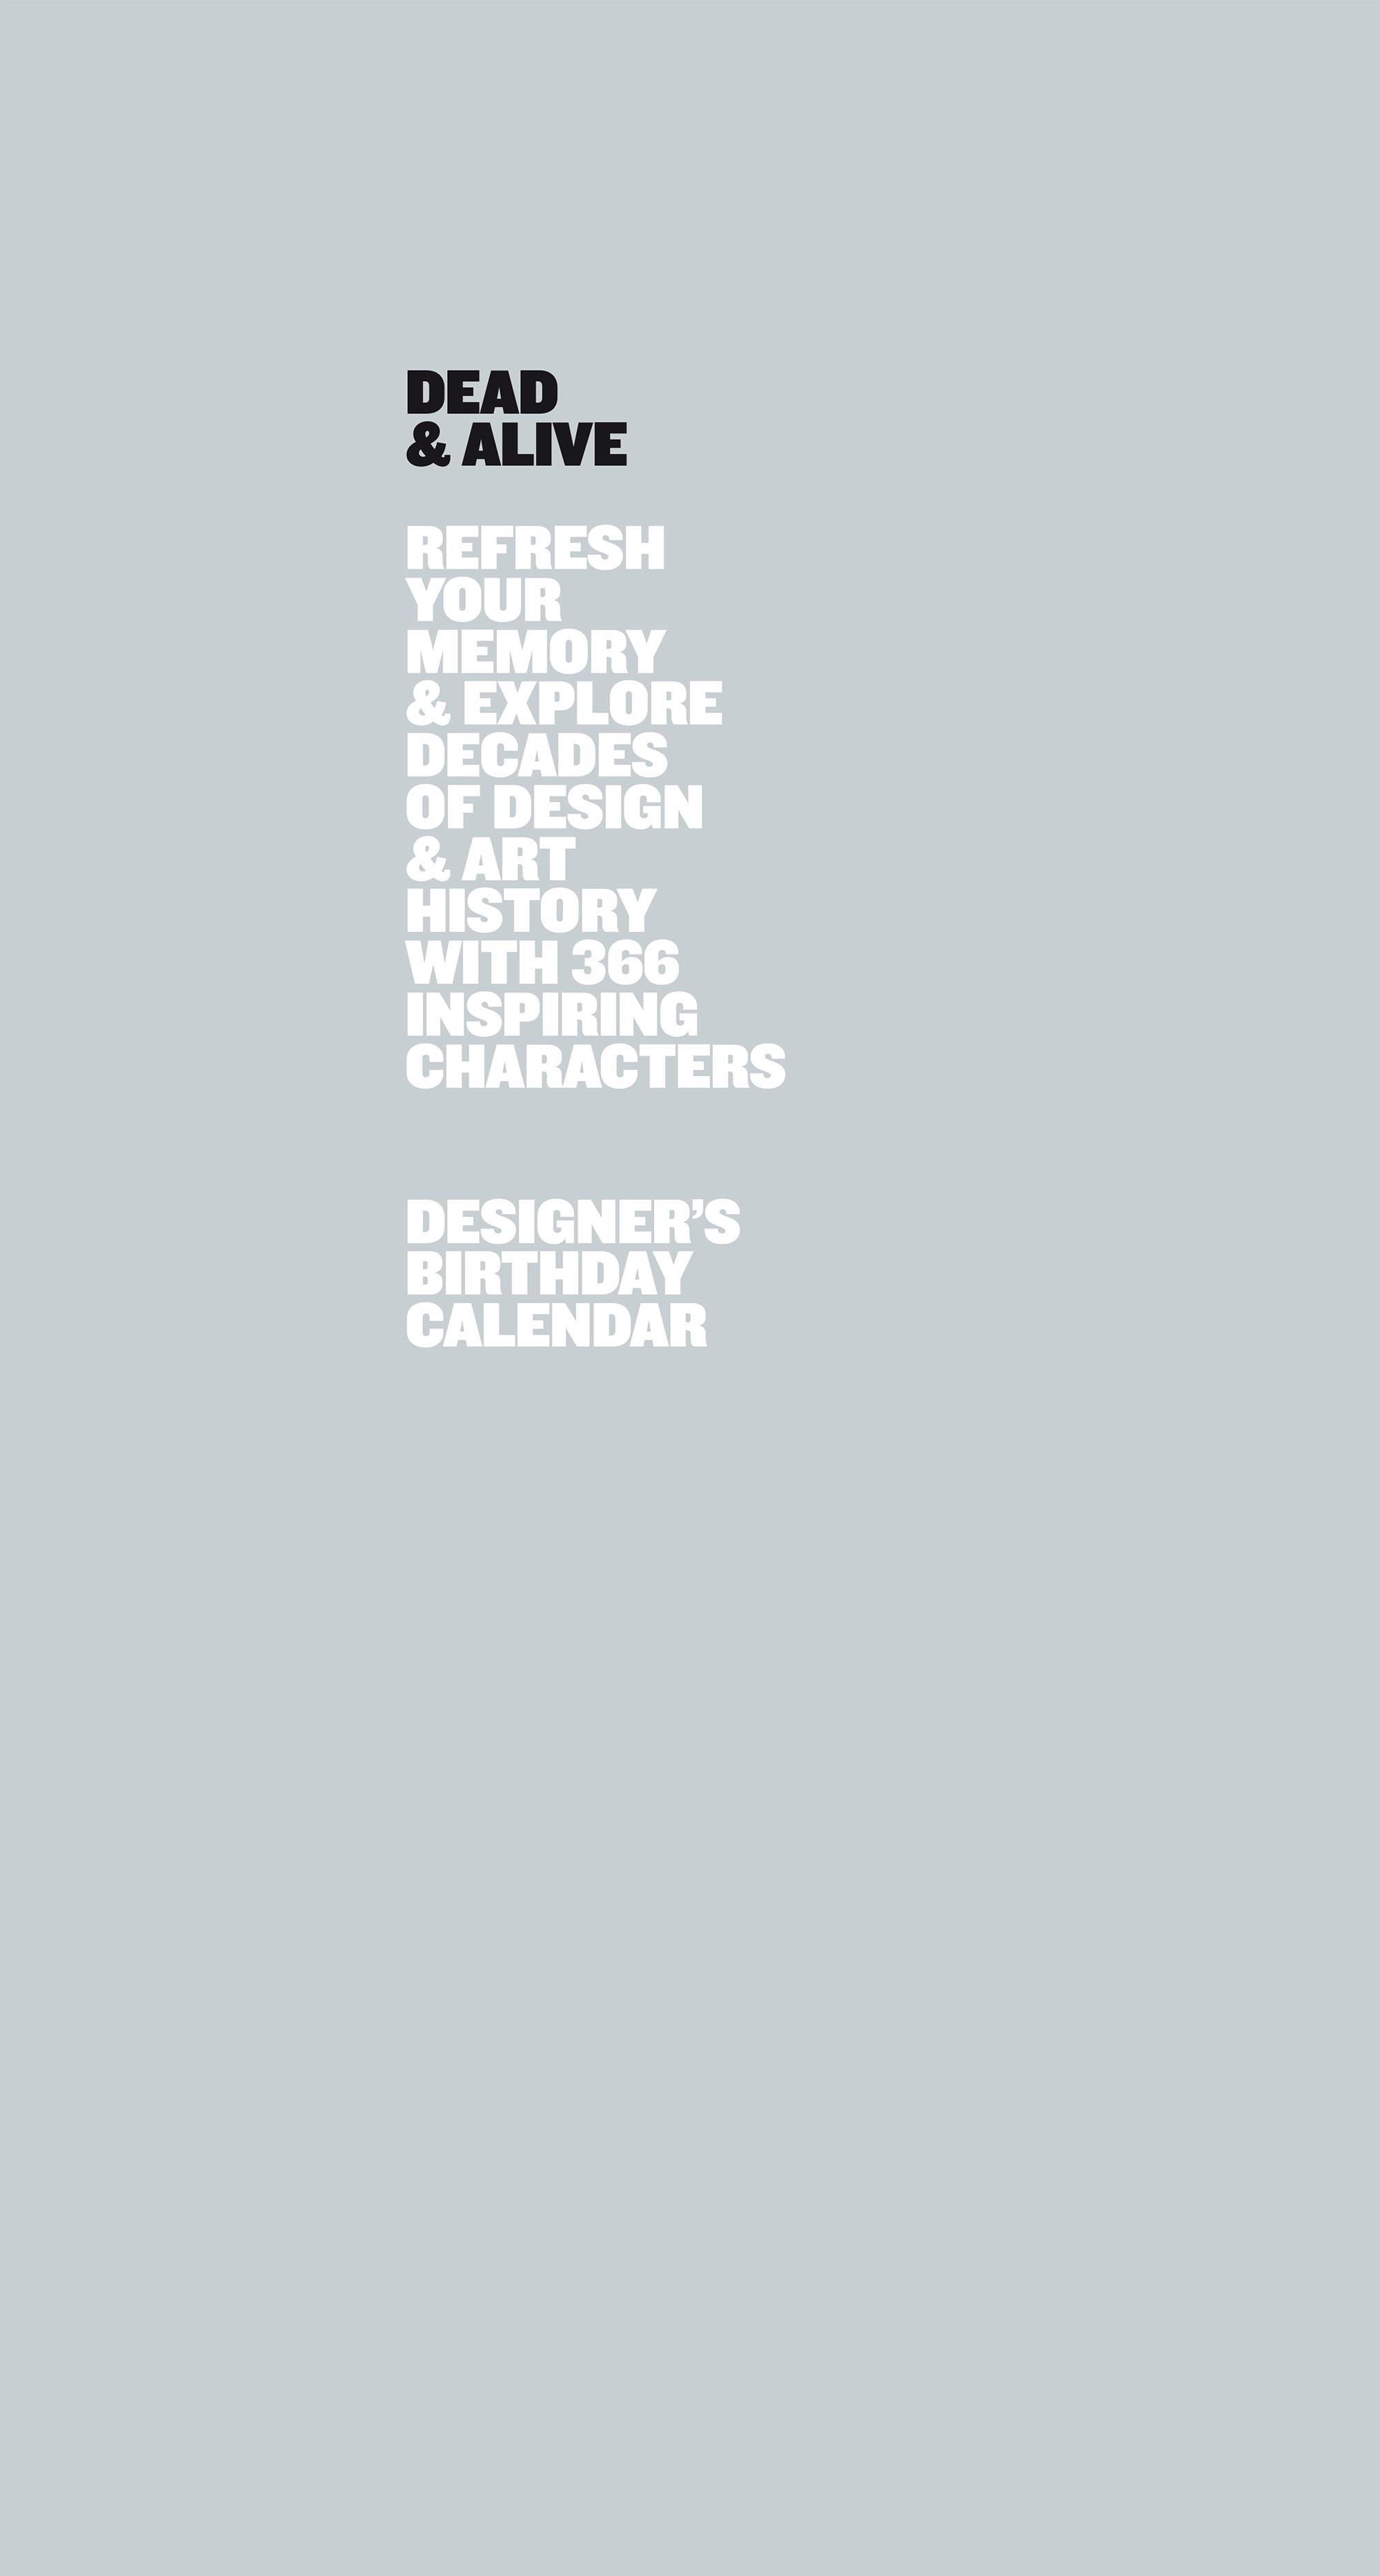 Dead & Alive – Birthday Calendar